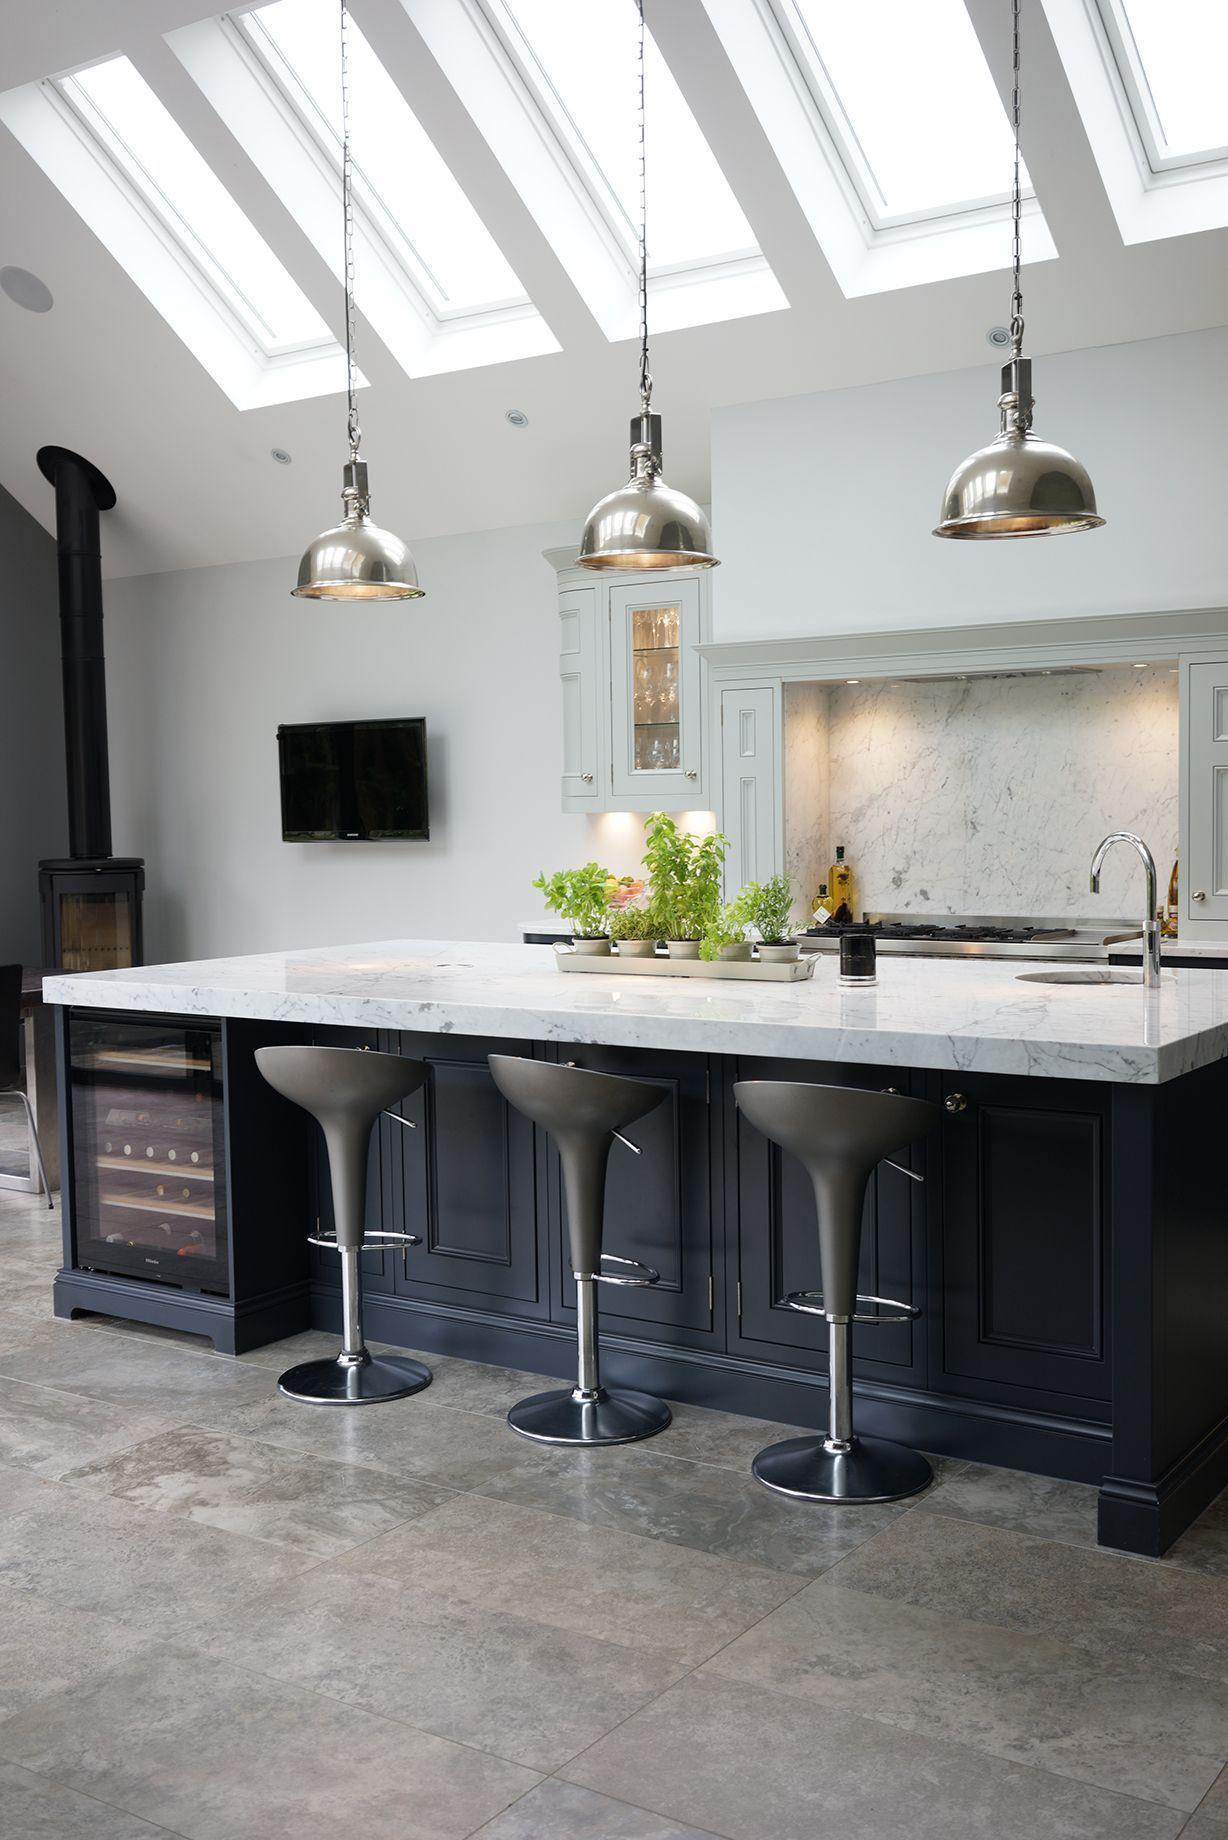 Explore Kitchen Island Ideas On Pinterest See More Ideas About Kitchen Island Idea Kitchen Island Decor Kitchen Island With Seating Rustic Kitchen Island